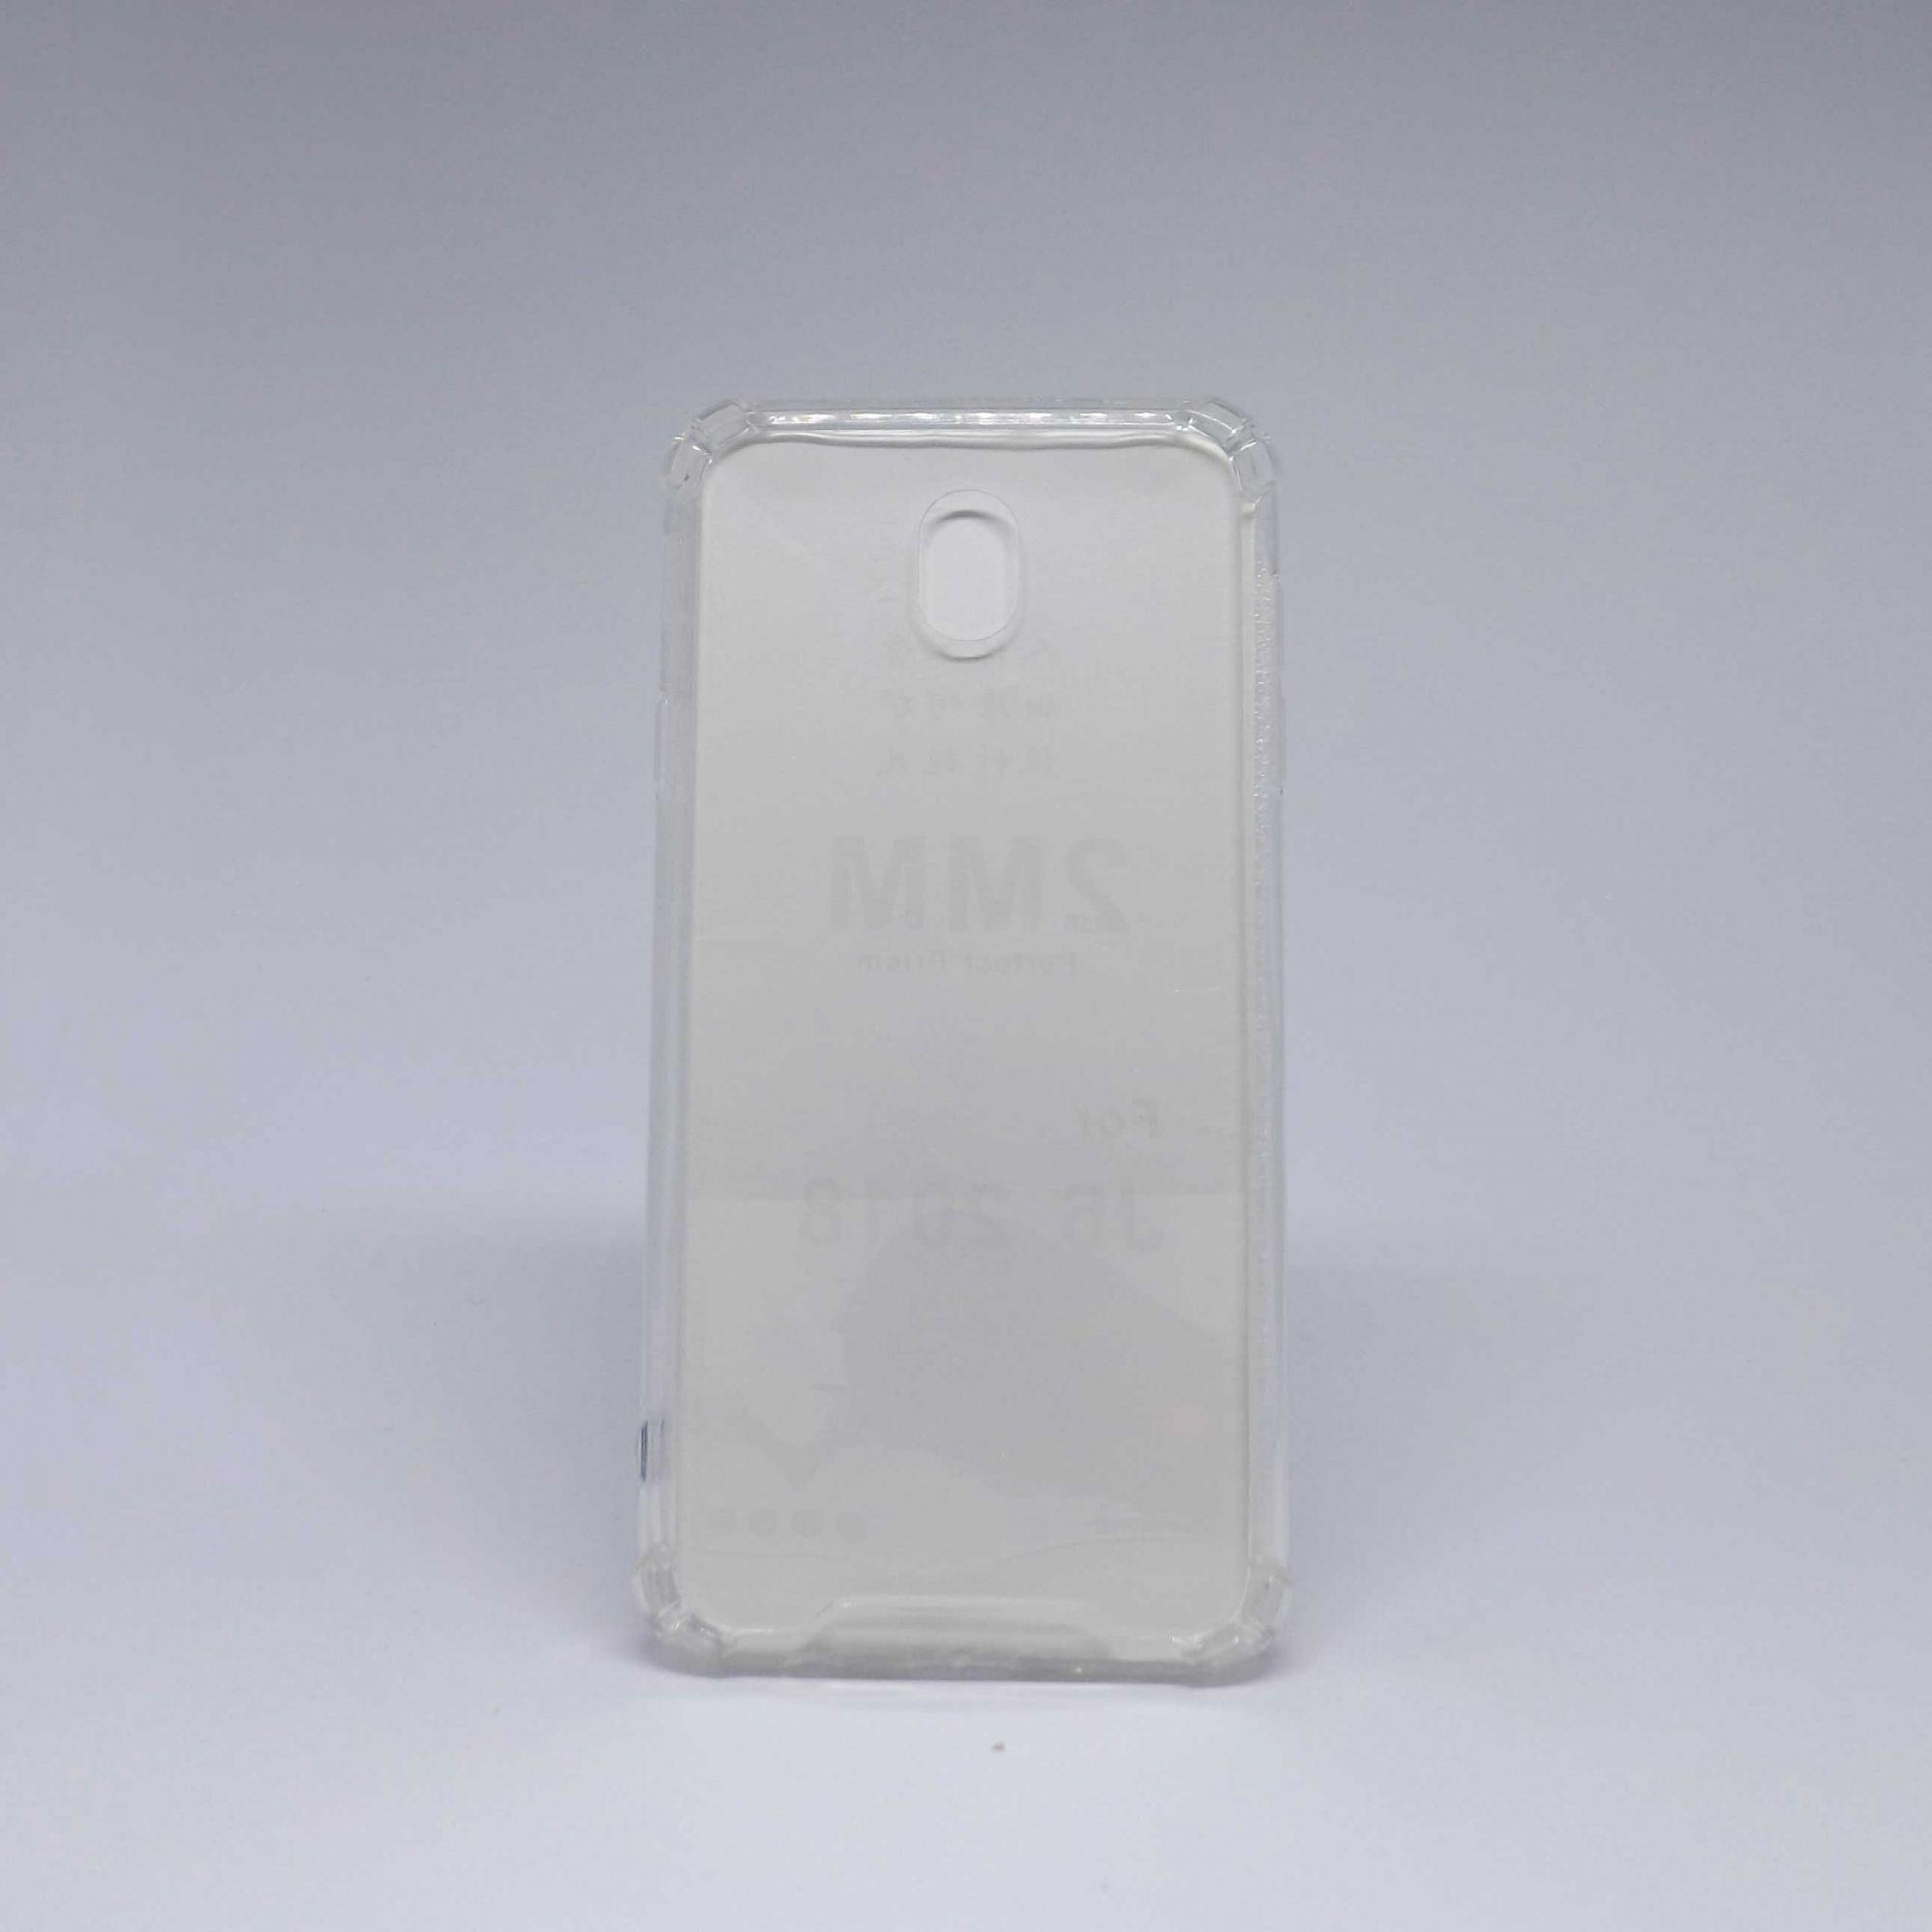 Capa Samsung Galaxy J7 Pro Antiqueda Transparente